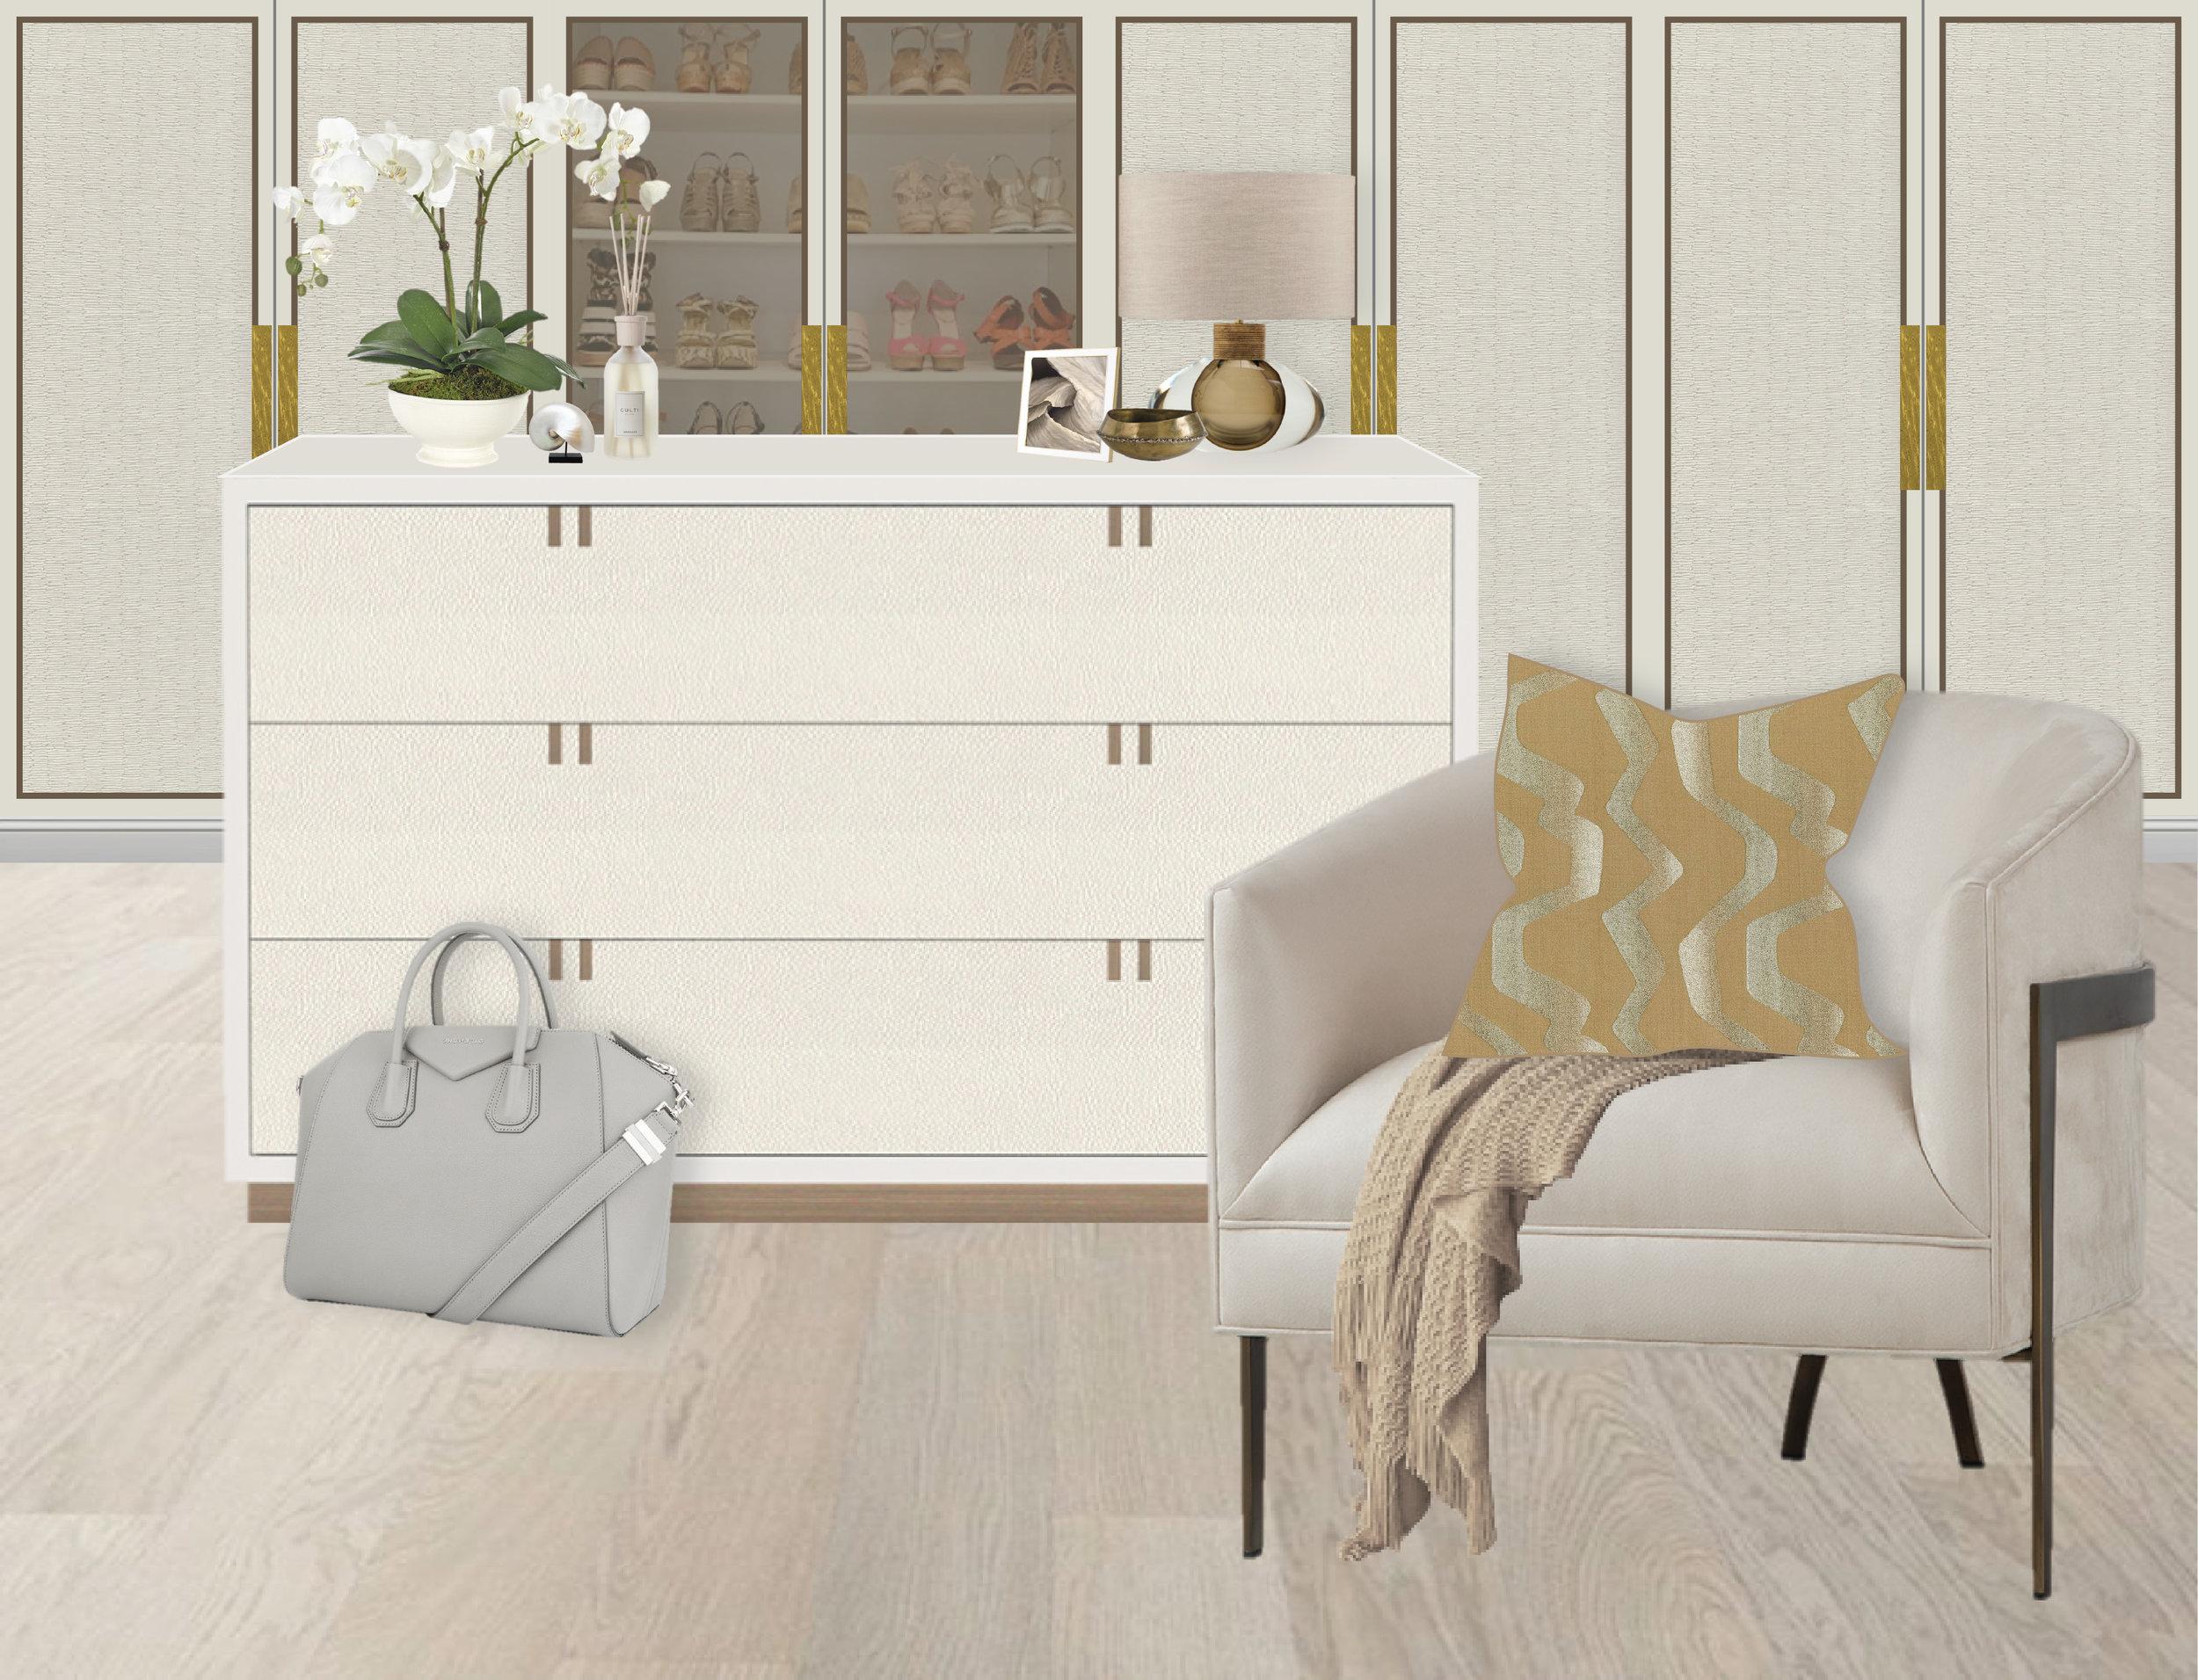 Women's Dressing Room by Synonymous | Luxury Interior Design NYC | Synonymouss.com.jpg